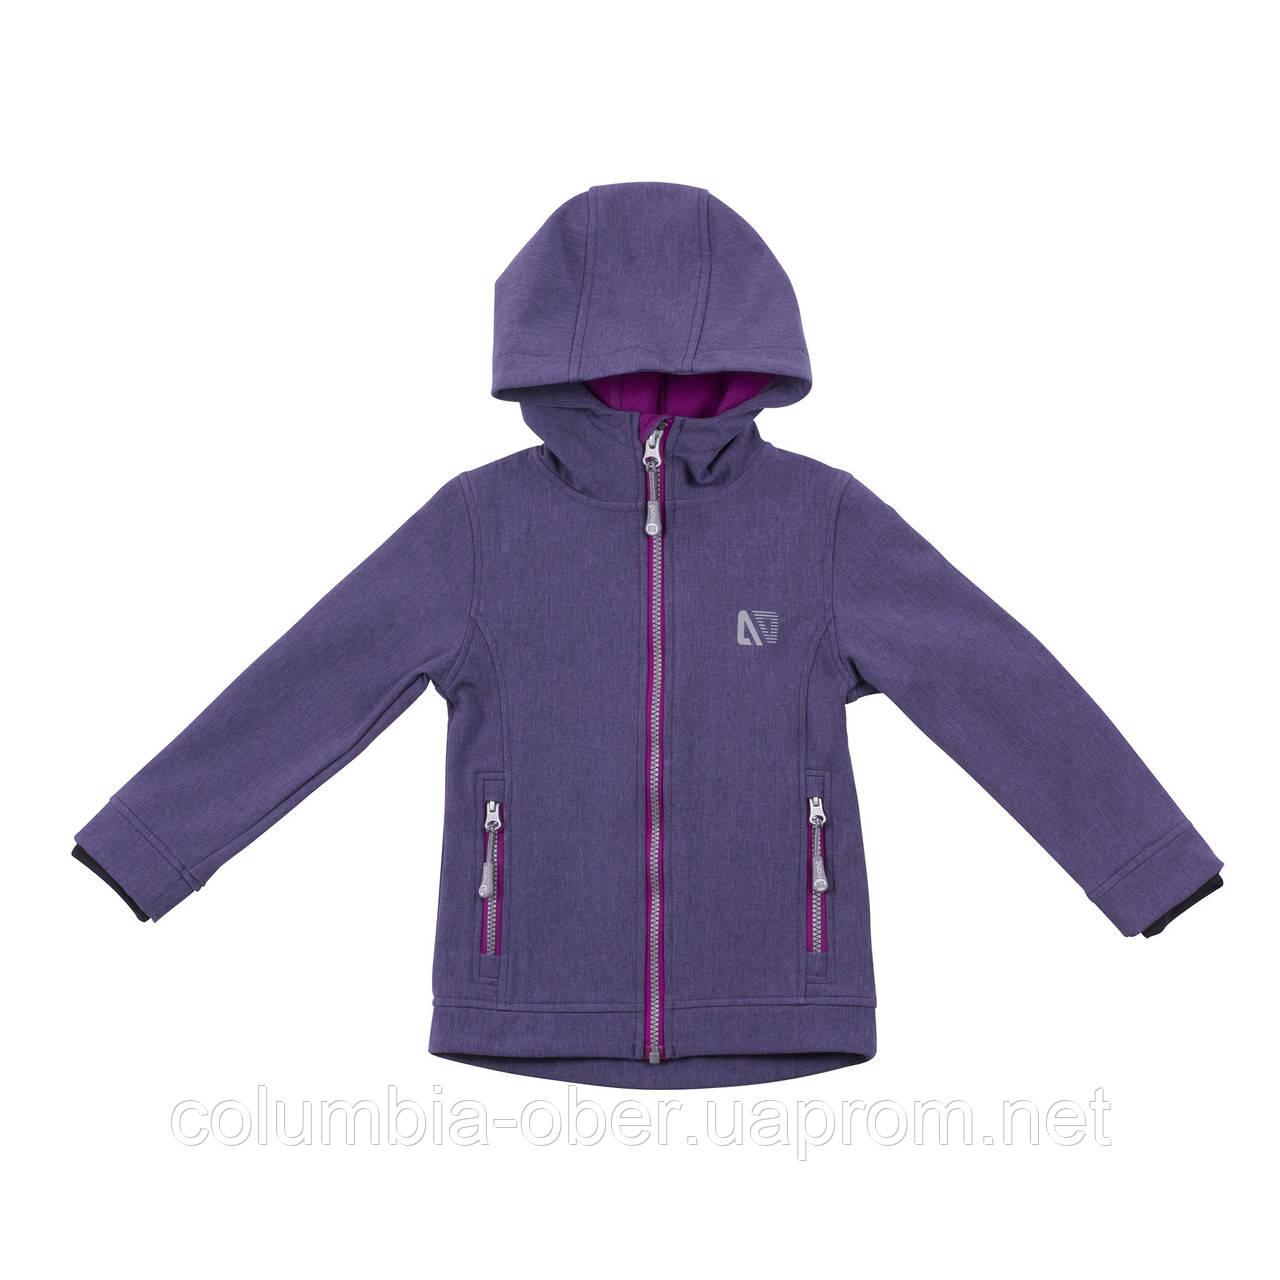 Демисезонная куртка для девочки NANO F18 M 1400 Cold Blue Mix. Размер 2-14.